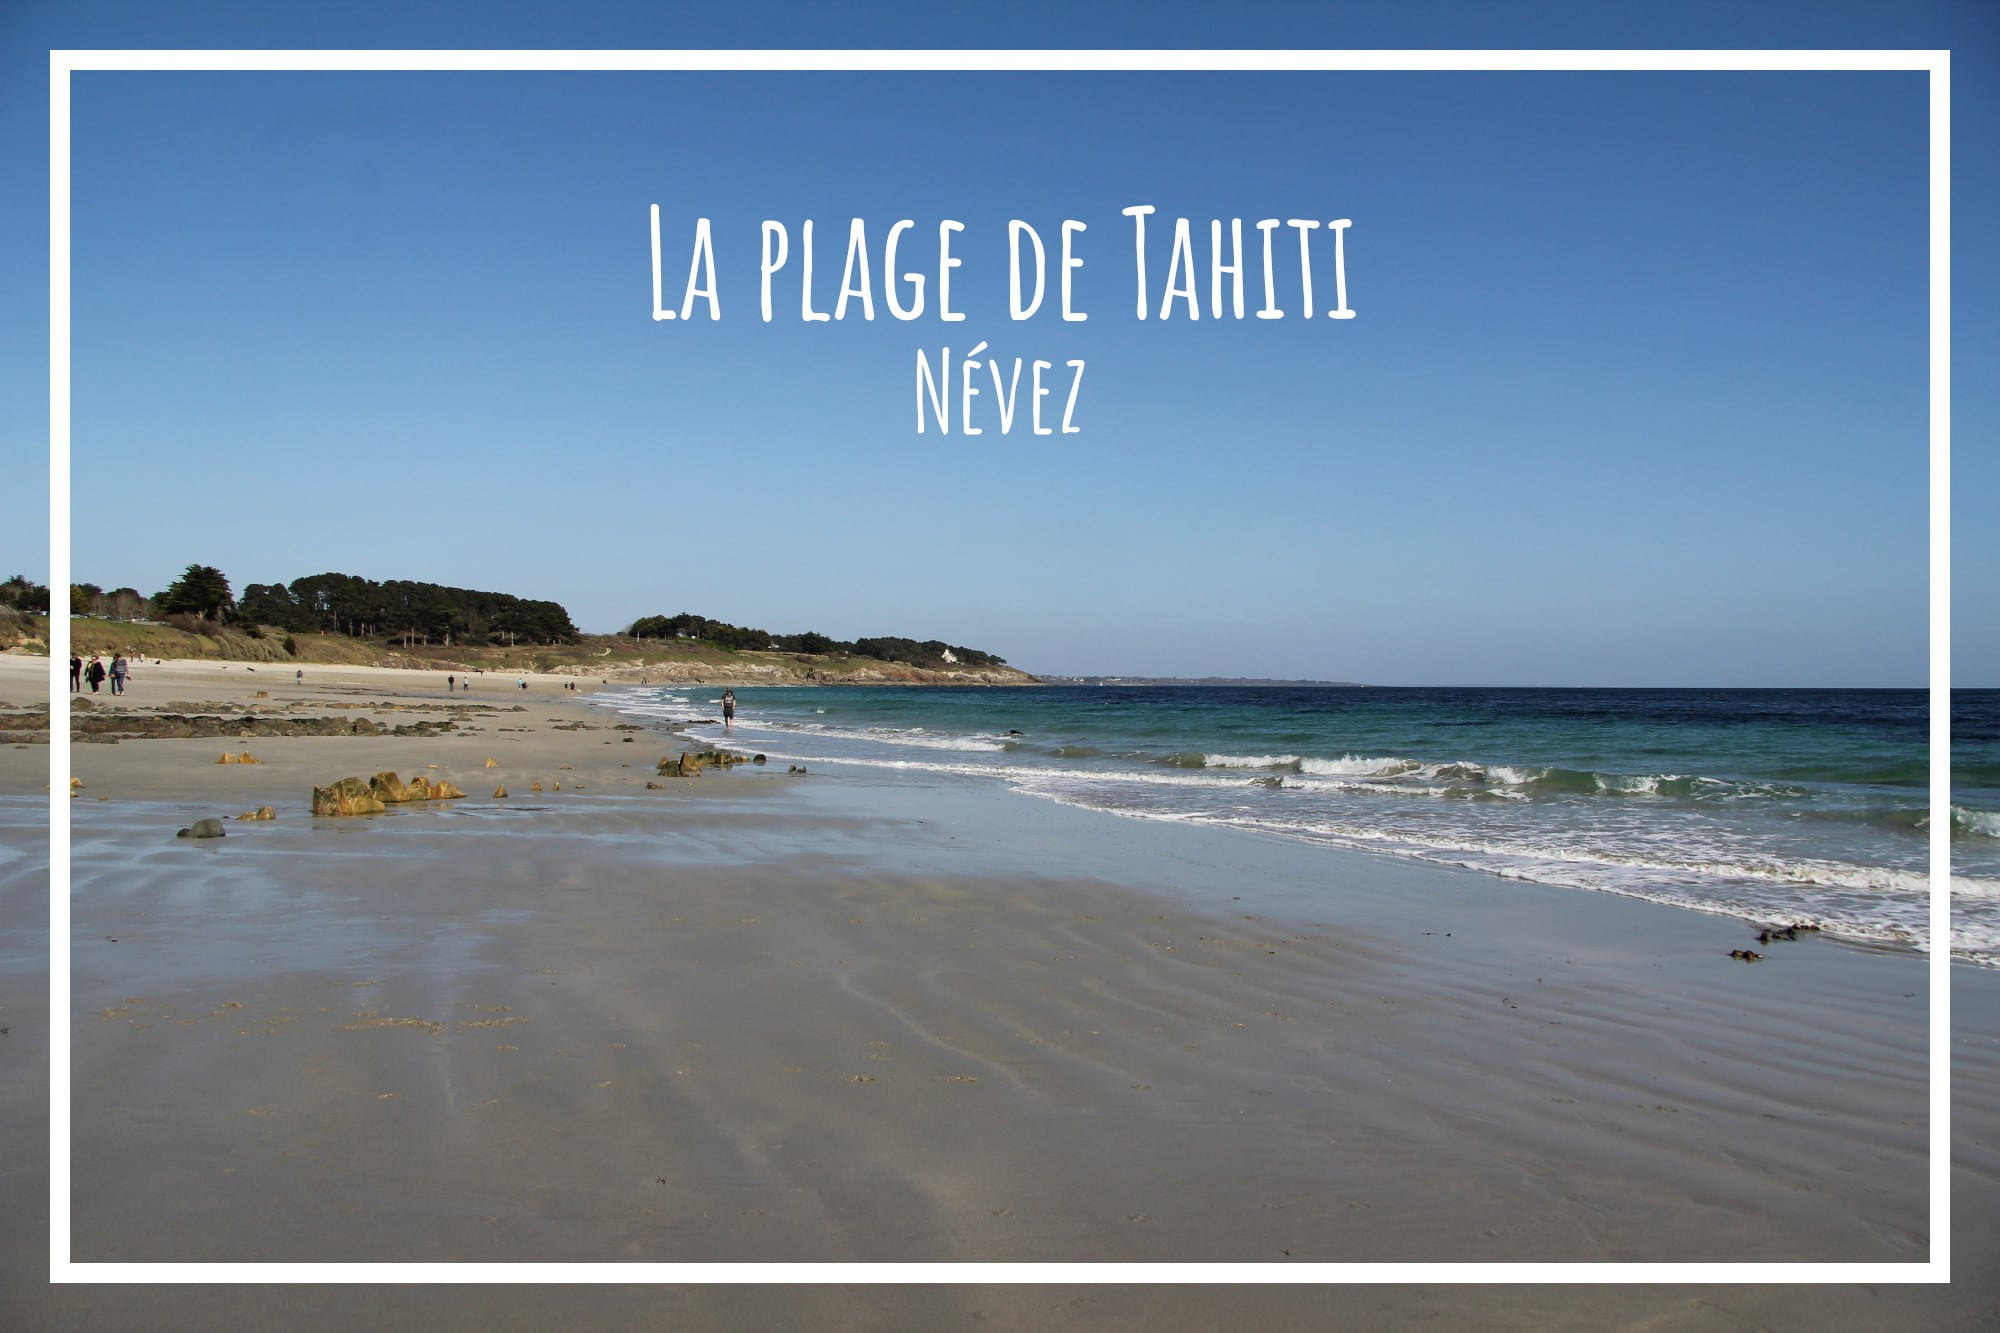 La plage de Tahiti à Névez